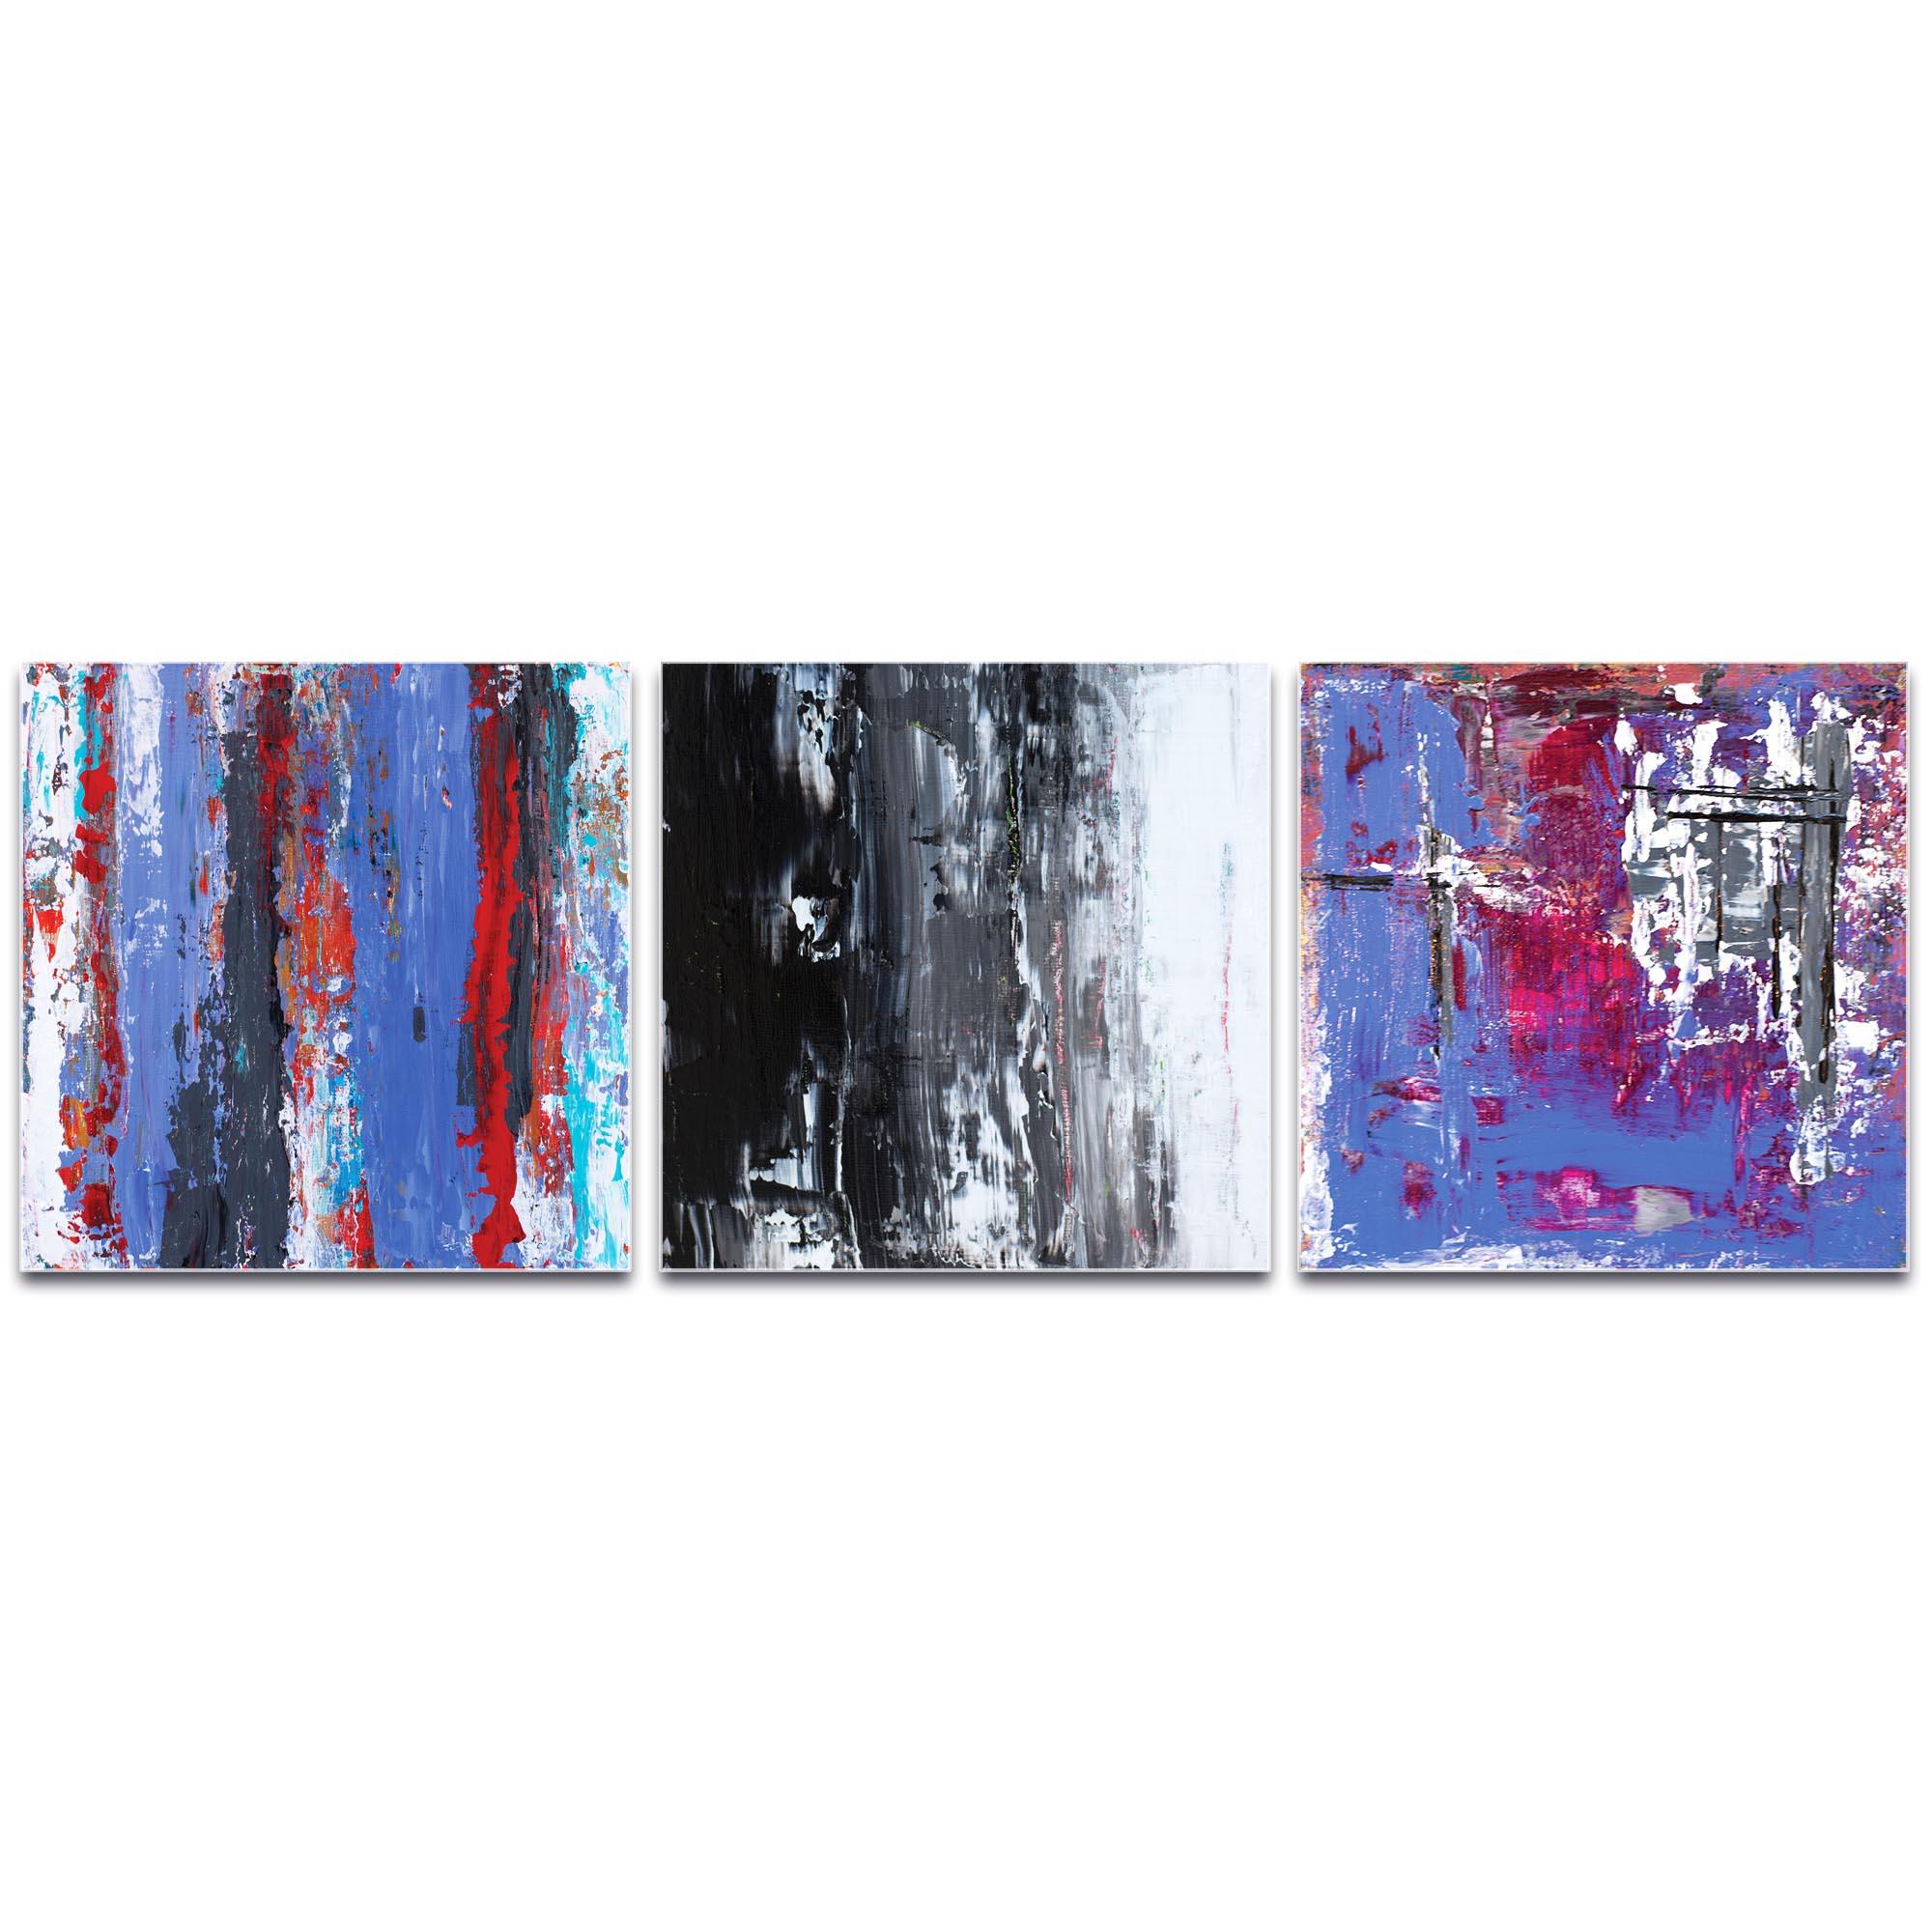 Abstract Wall Art 'Urban Triptych 4 Large' - Urban Decor on Metal or Plexiglass - Image 2